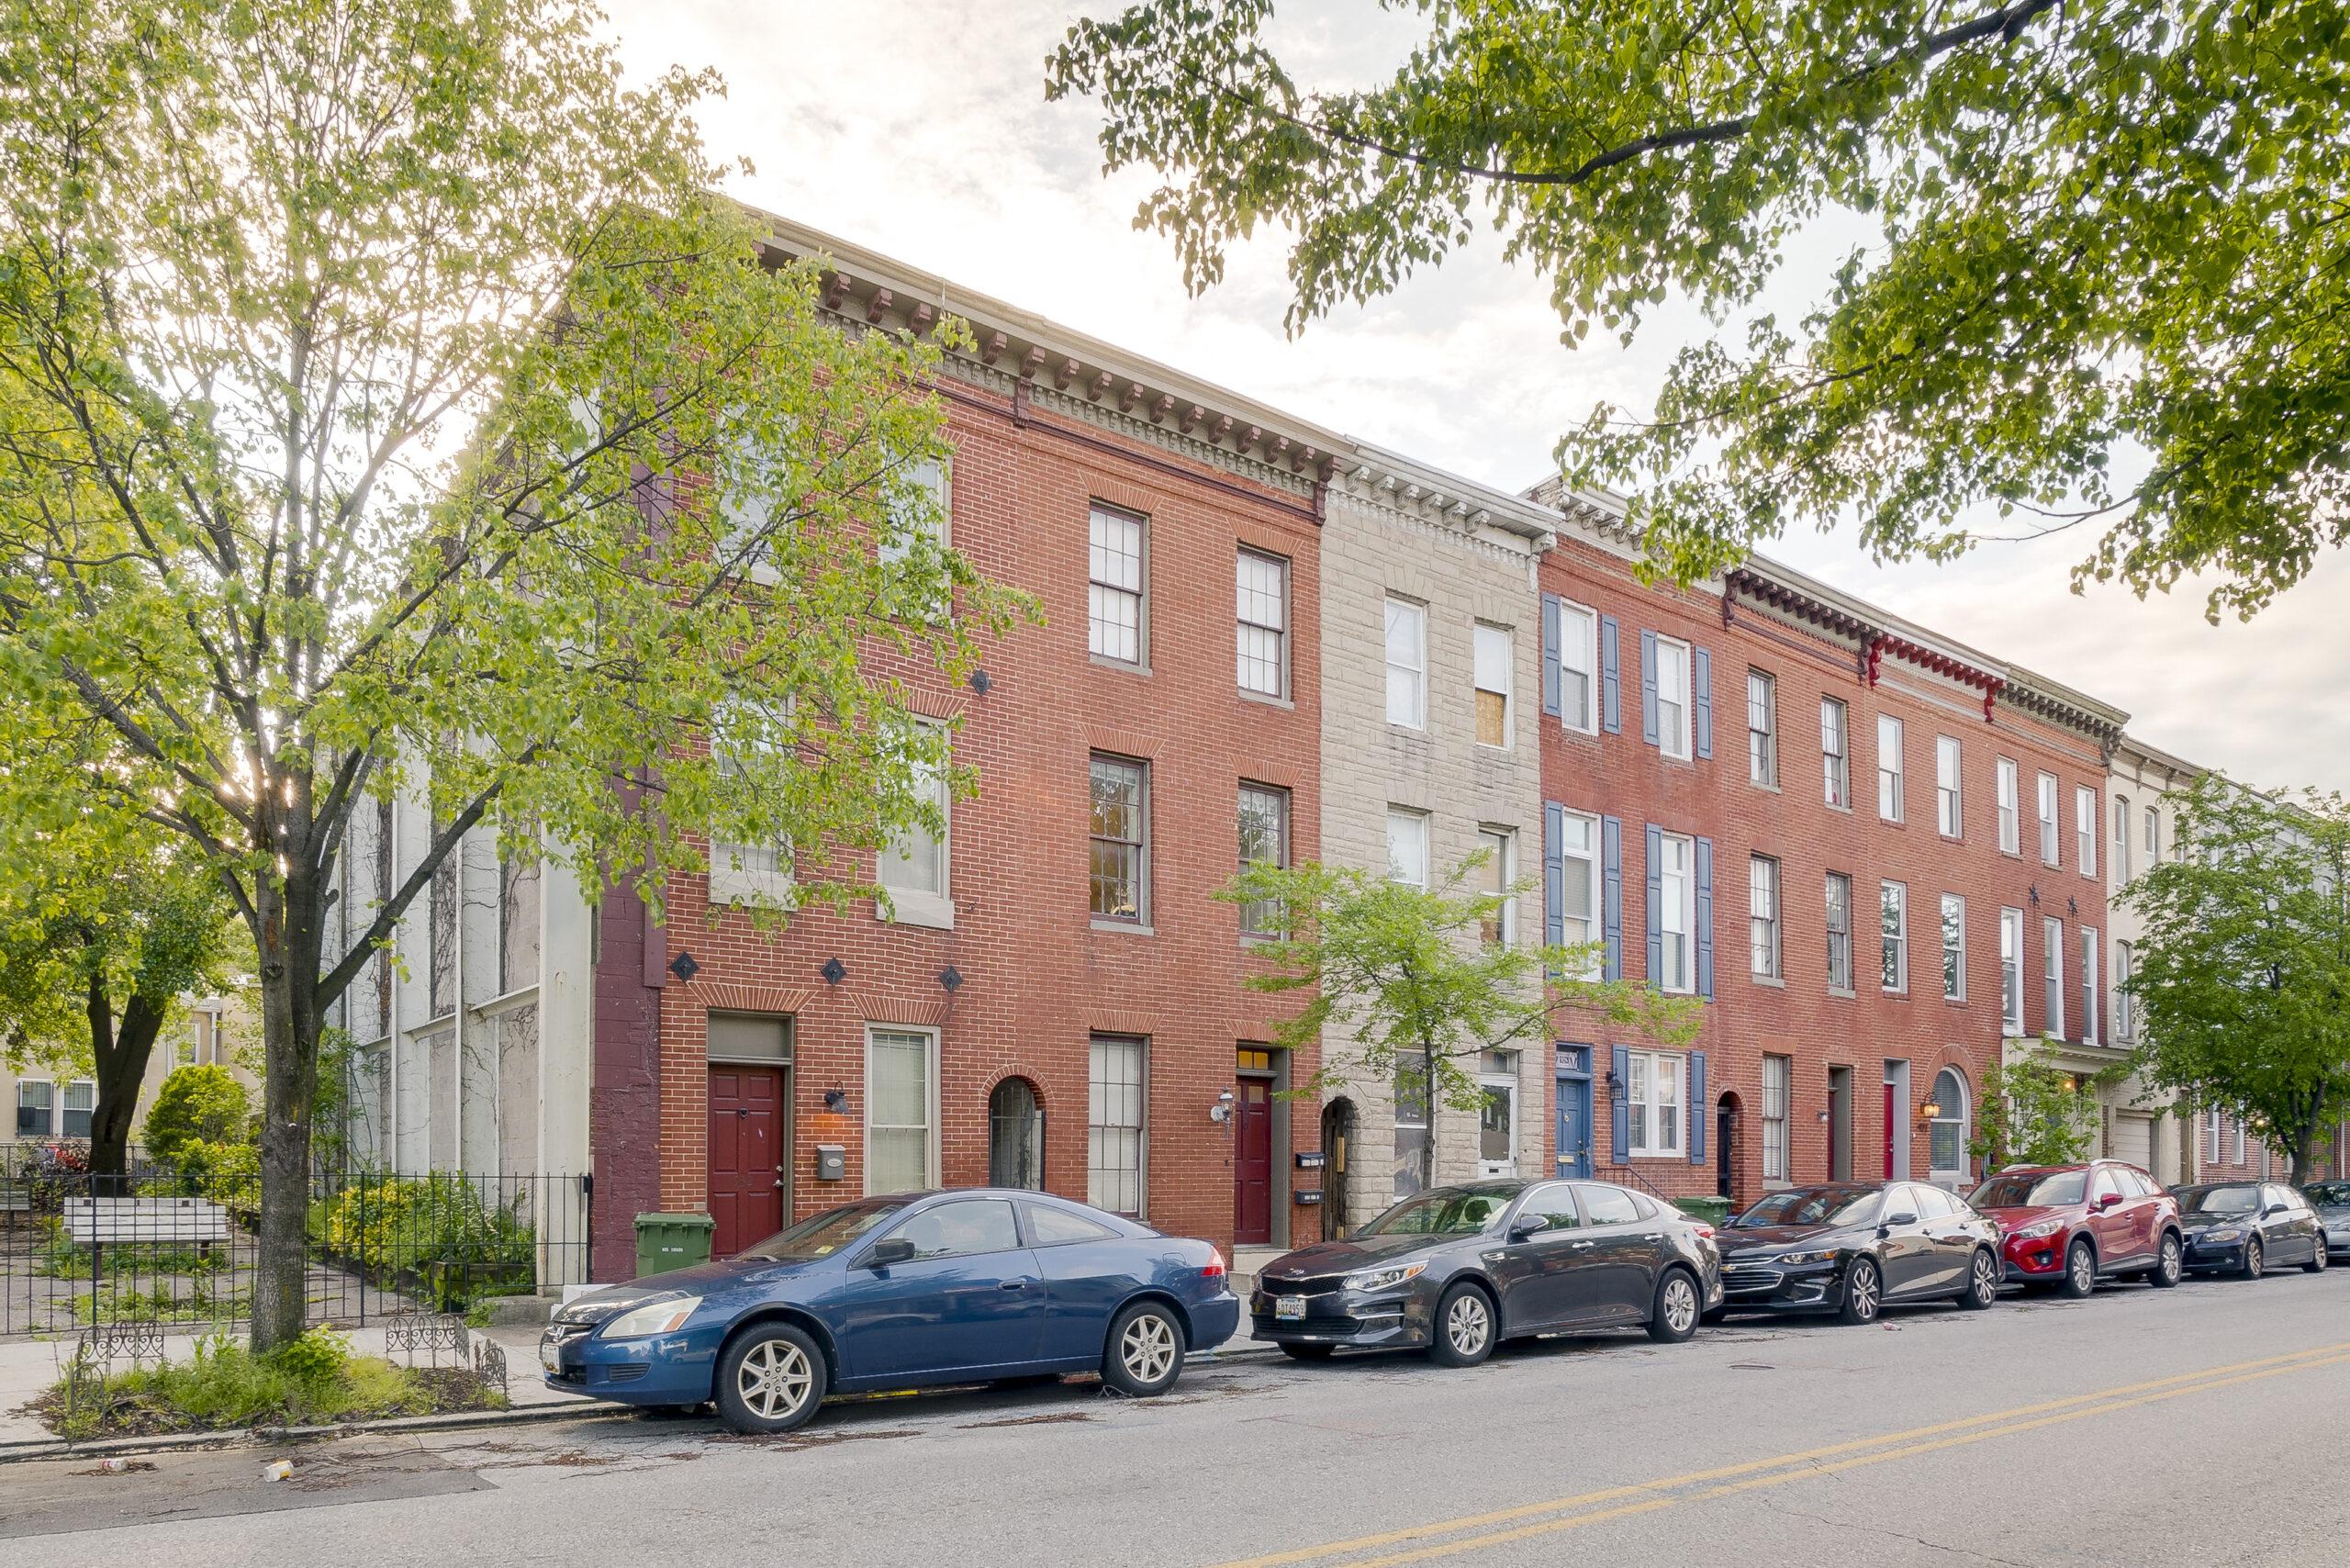 932 S Hanover:  3 Bedroom-3 Bath Rental in Federal Hill